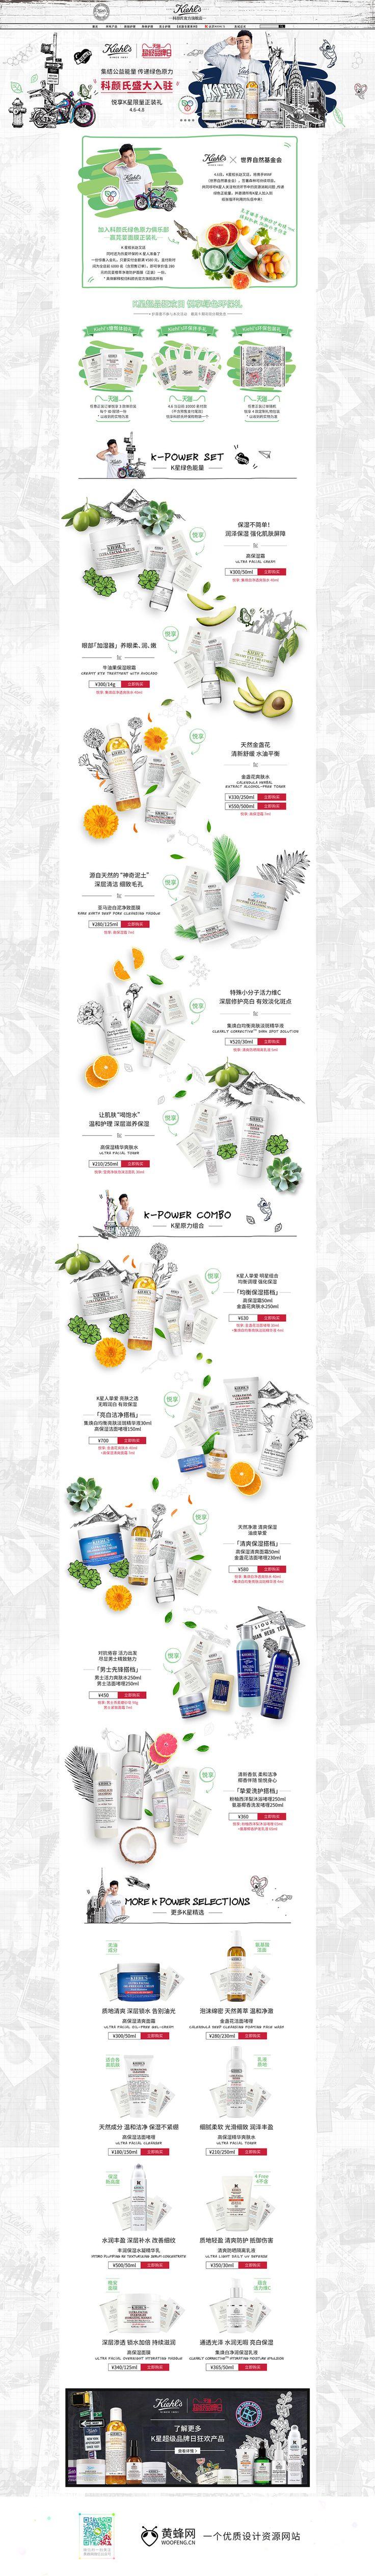 KIEHL'S科颜氏 美妆彩妆护肤化妆品 天猫首页活动专题页面设计 来源自黄蜂网http://woofeng.cn/